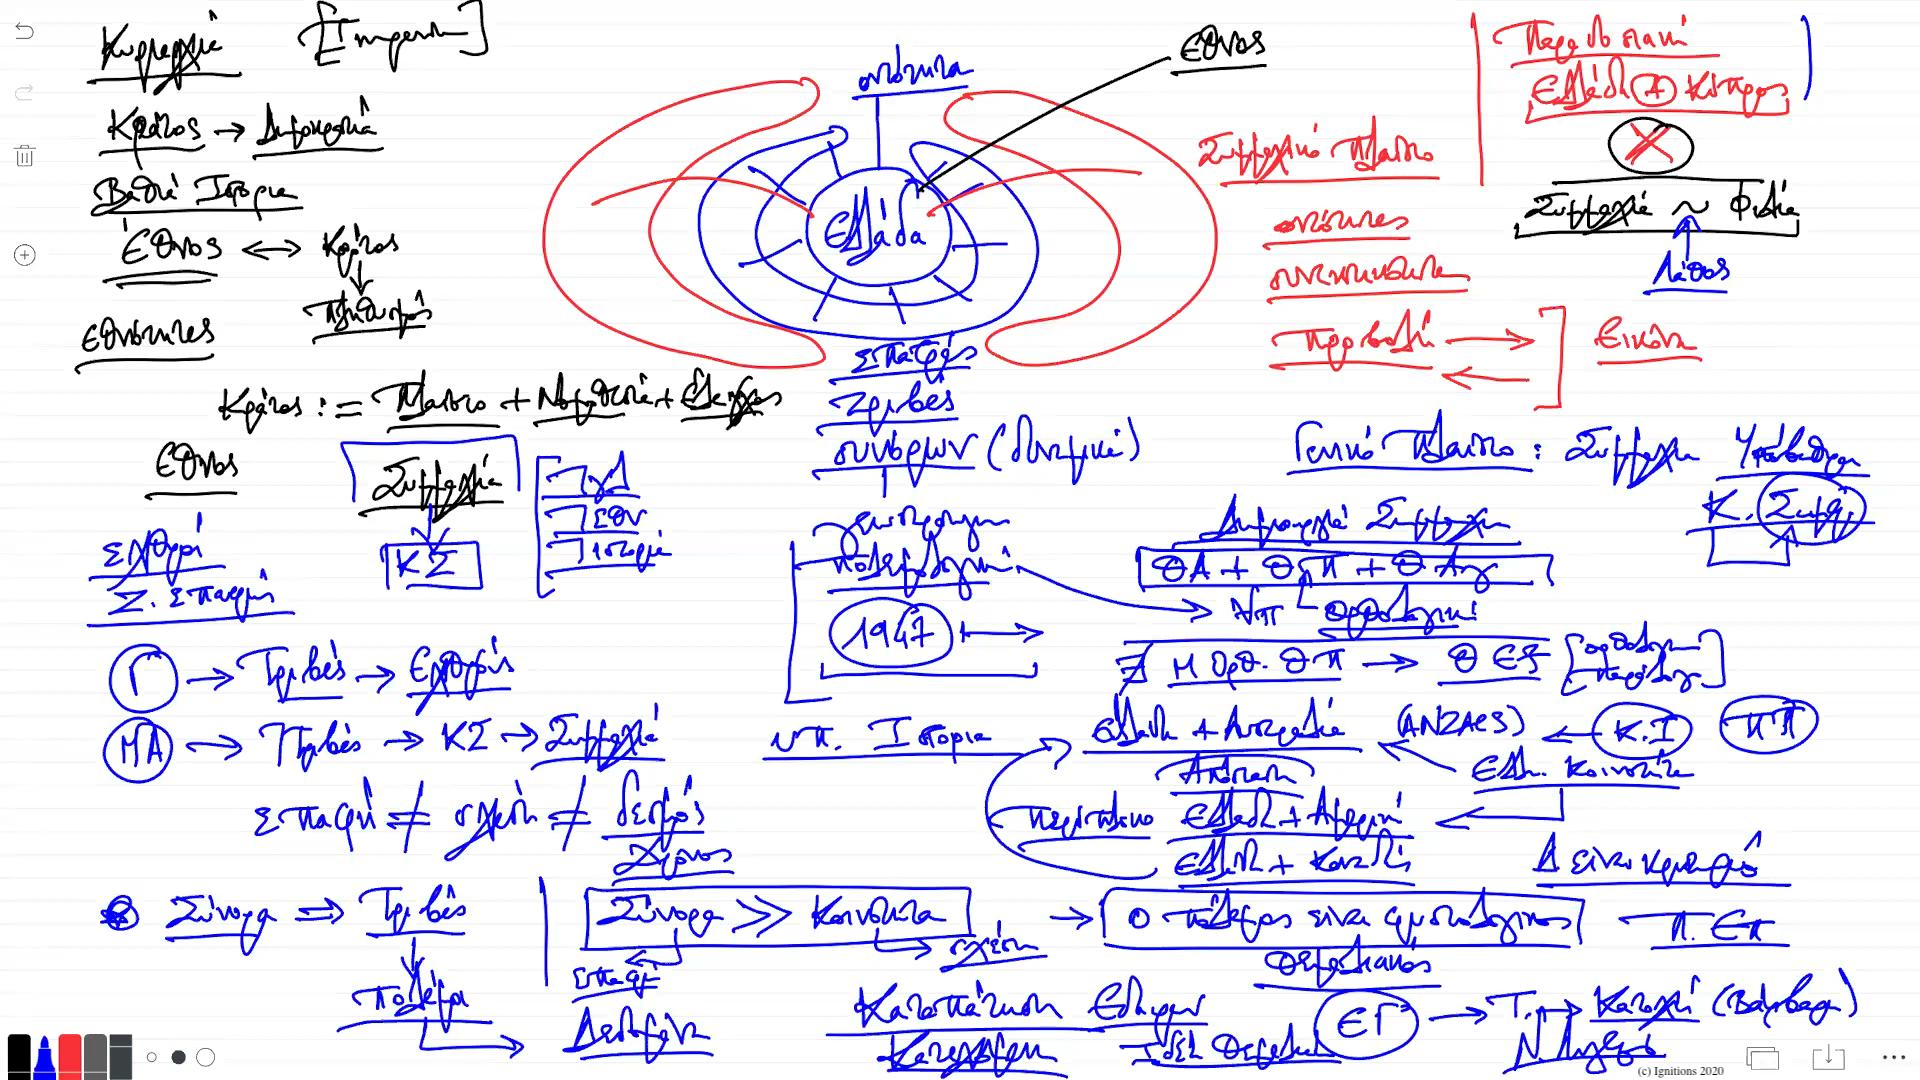 56020 - X - e-Διάλεξη: Ελληνική Γεωστρατηγική I. (Dessin)